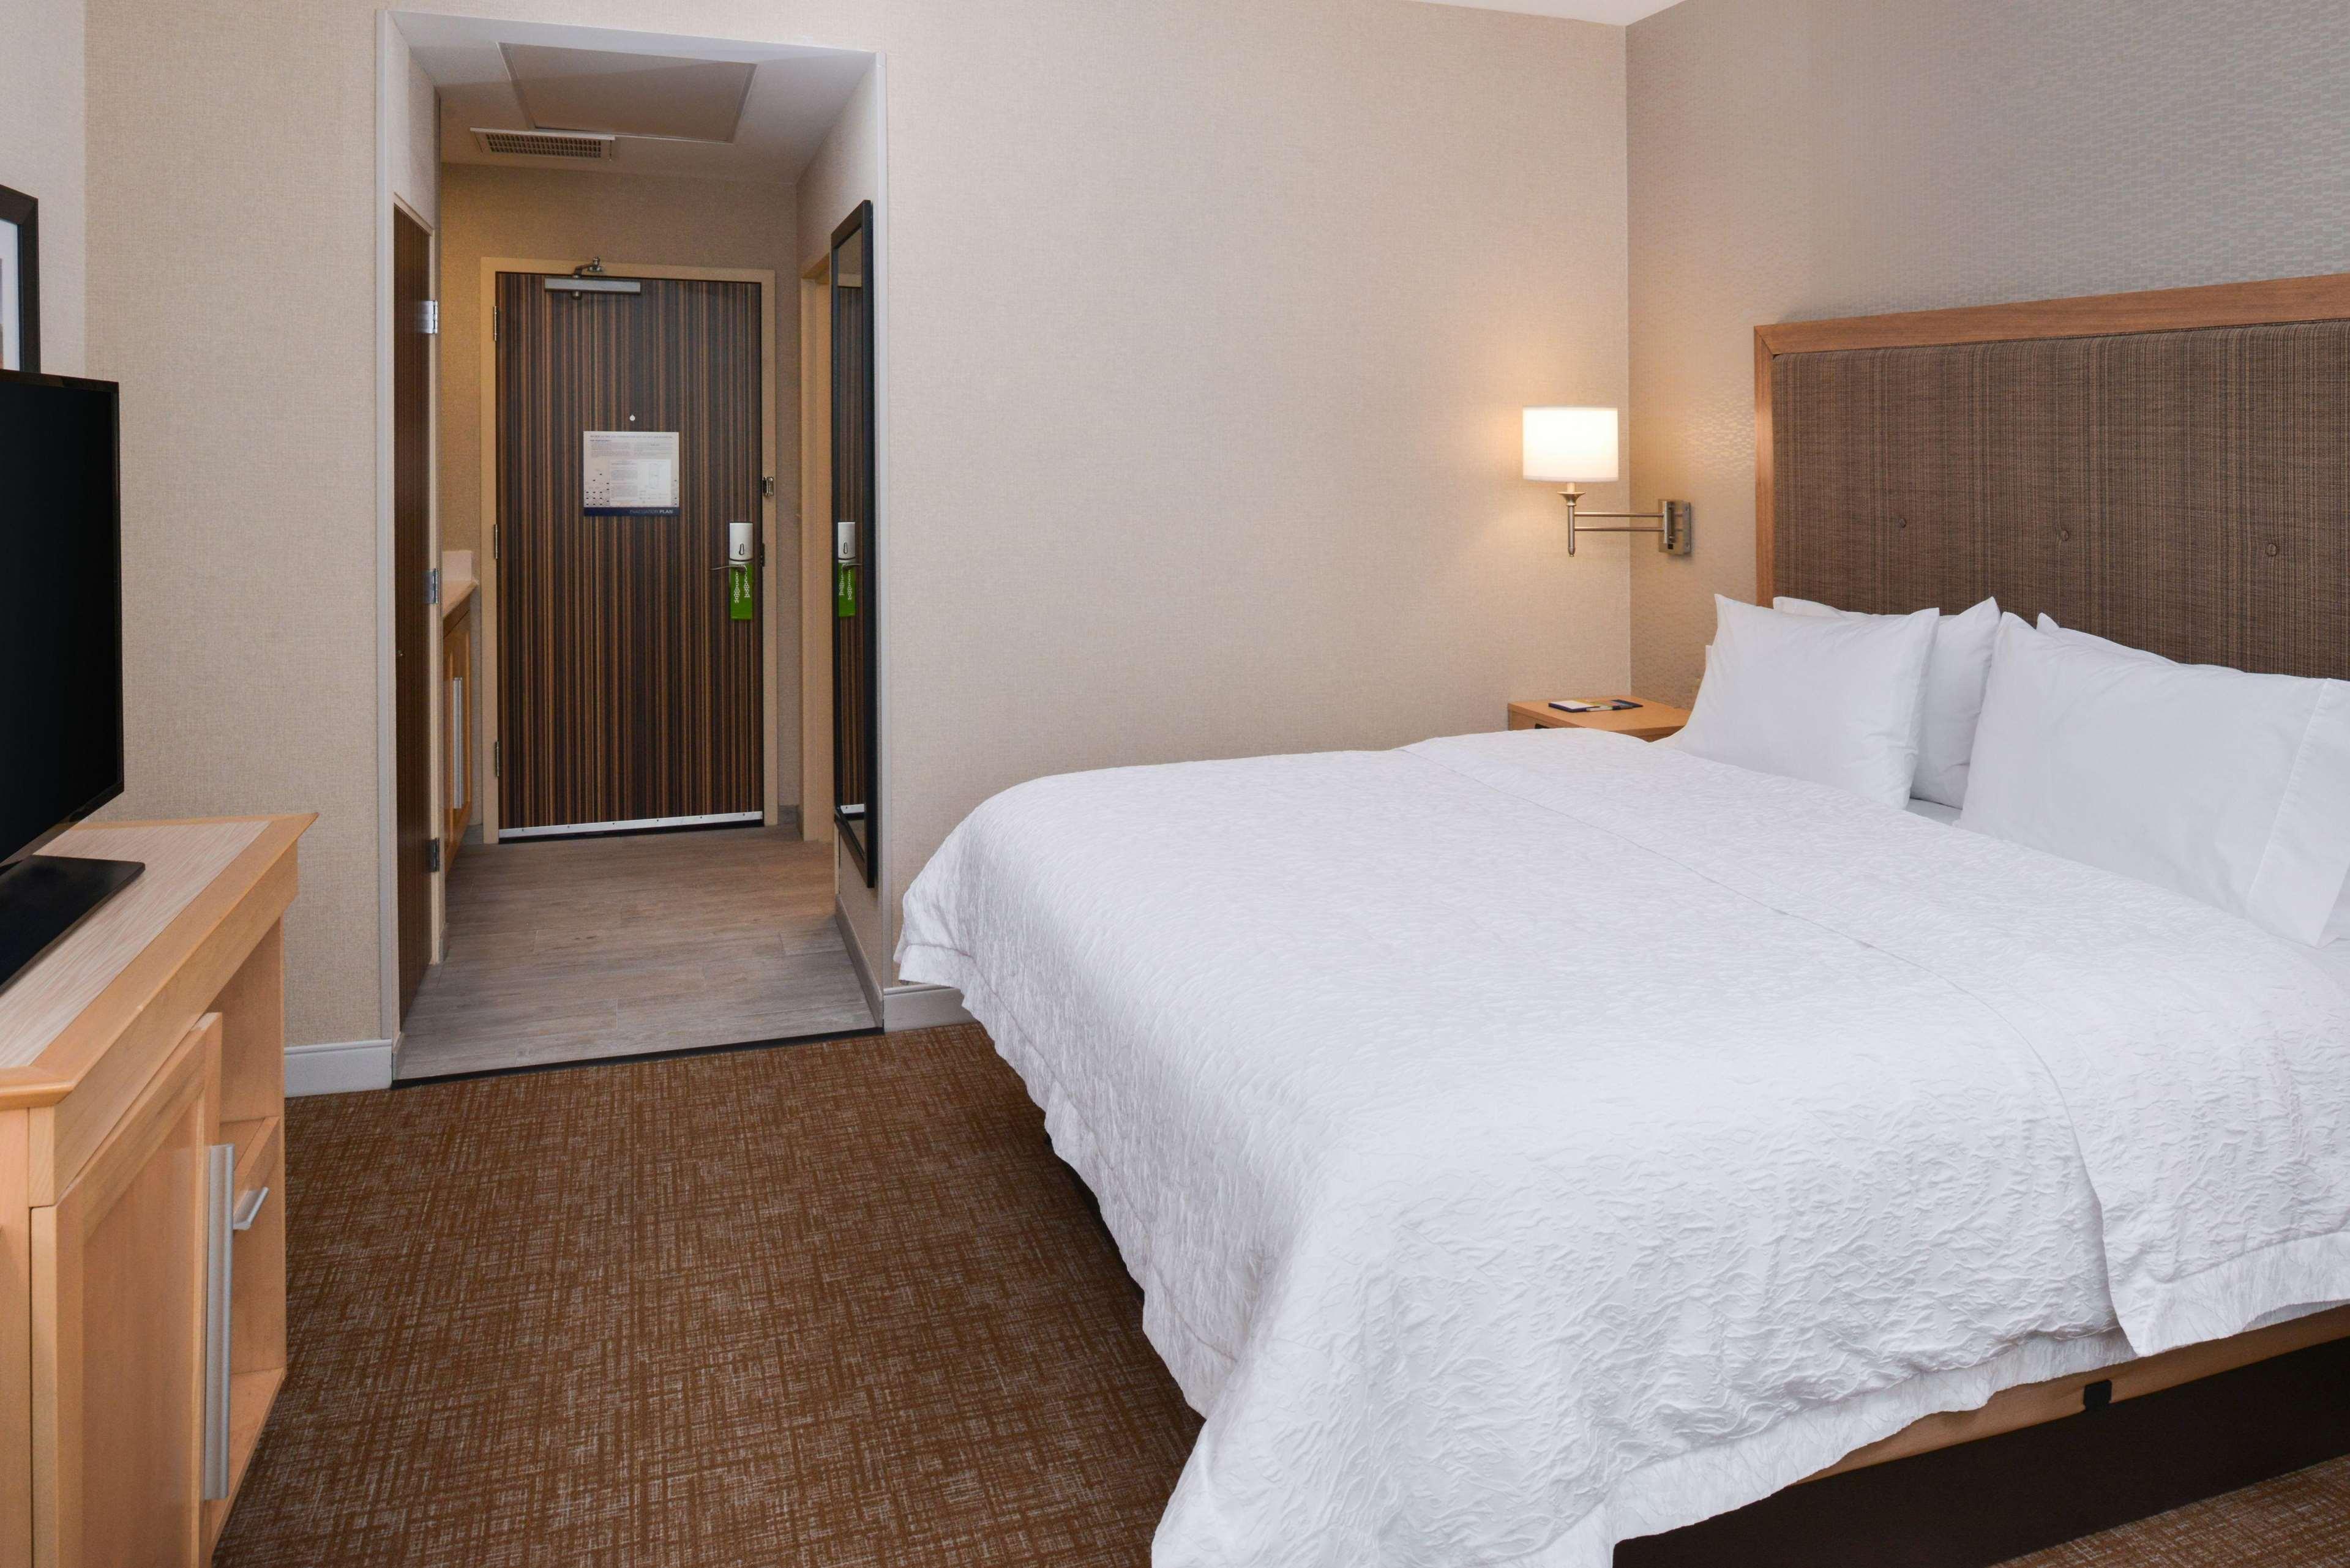 Hampton Inn & Suites Denver-Speer Boulevard image 38